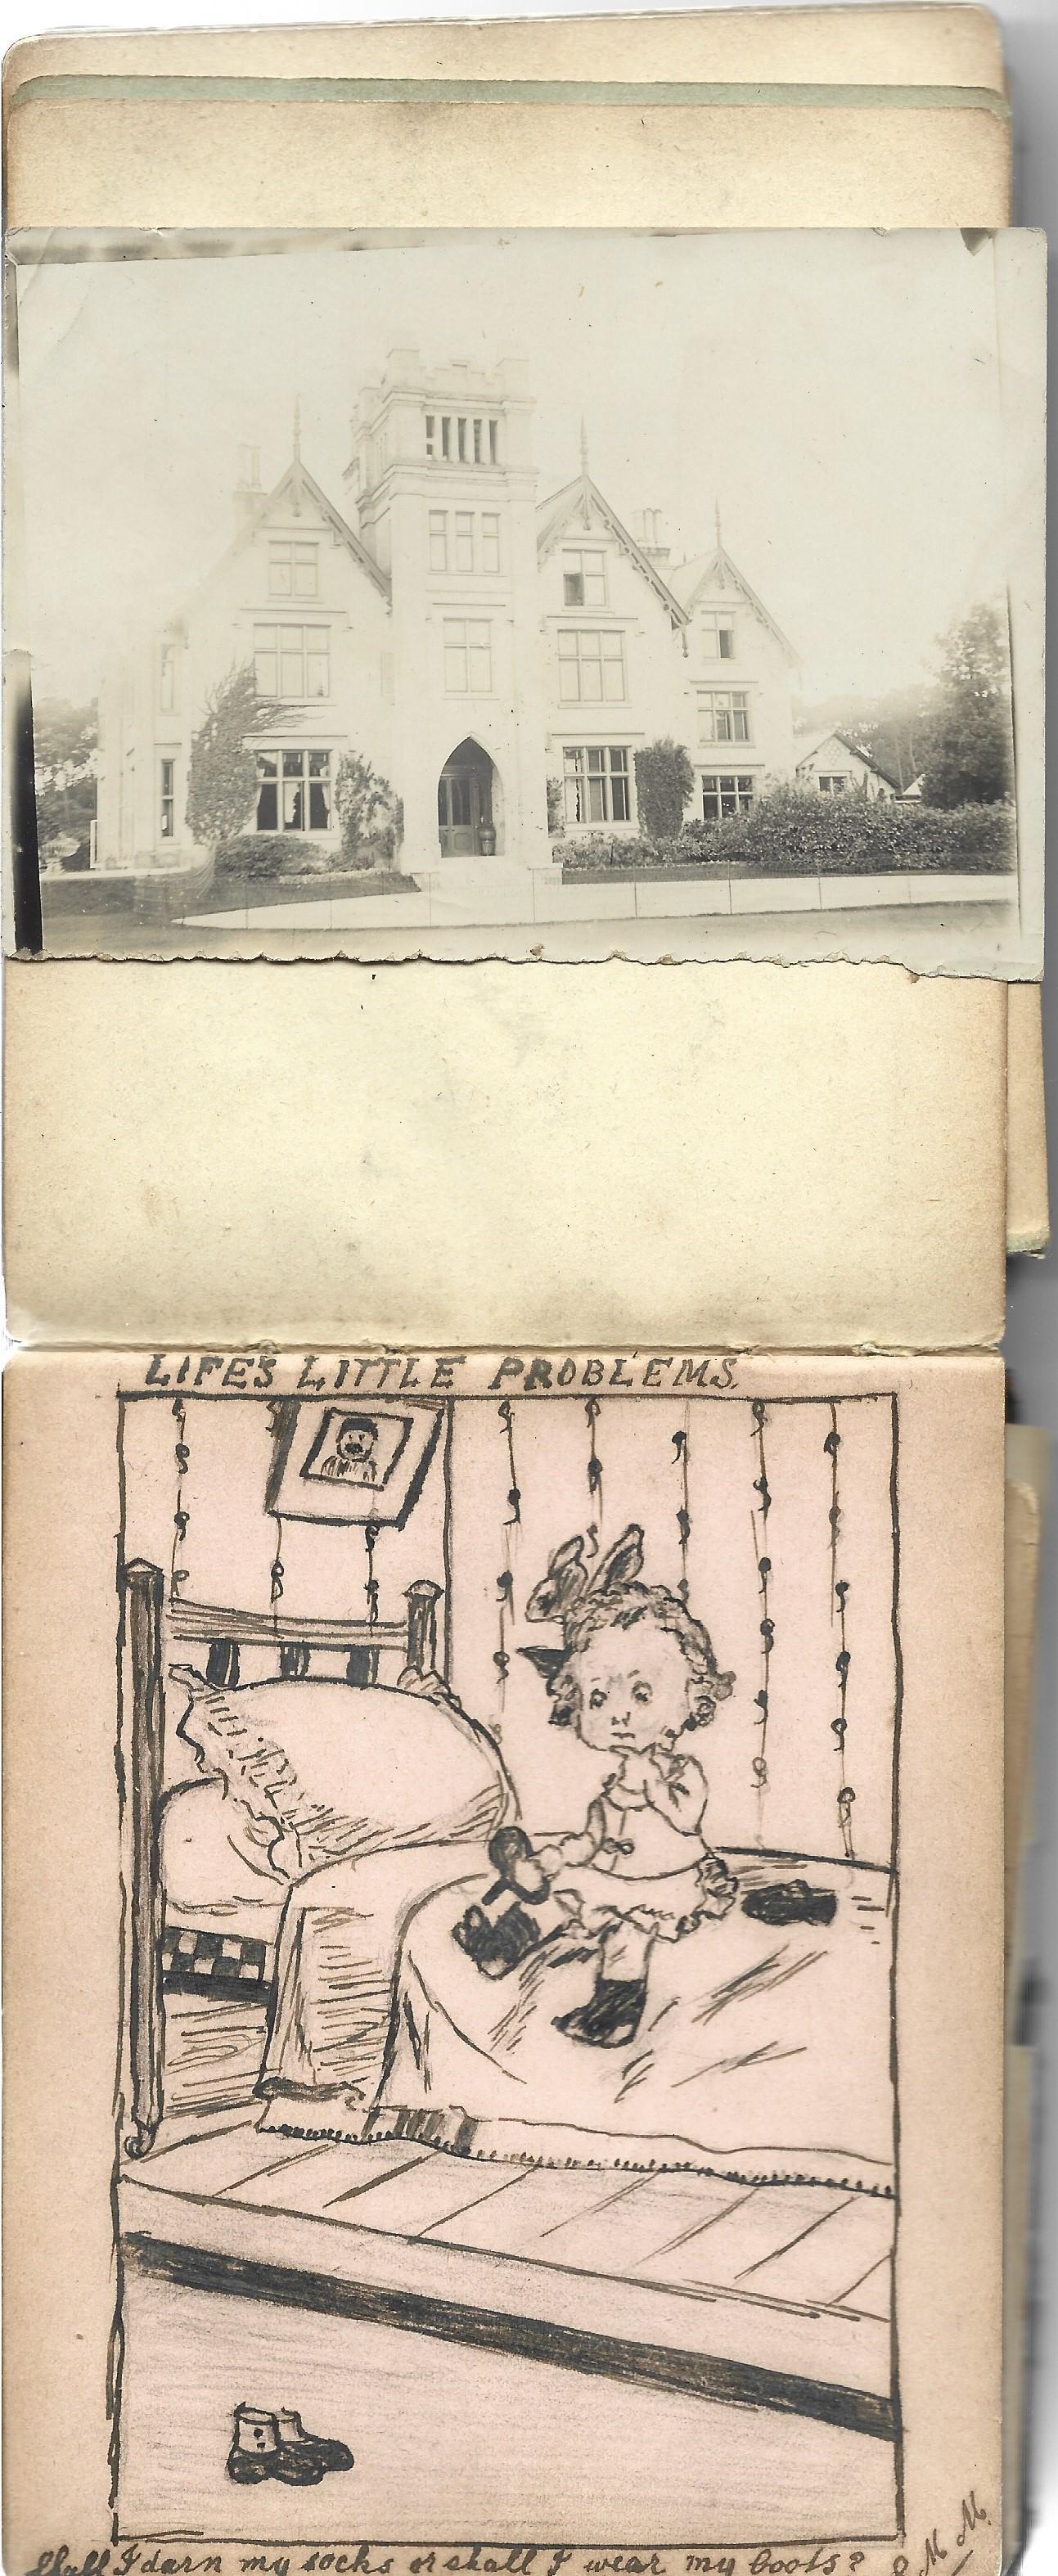 A World War 1 era autograph album, mostly comprising poignant poems and verses, a few original - Image 8 of 8